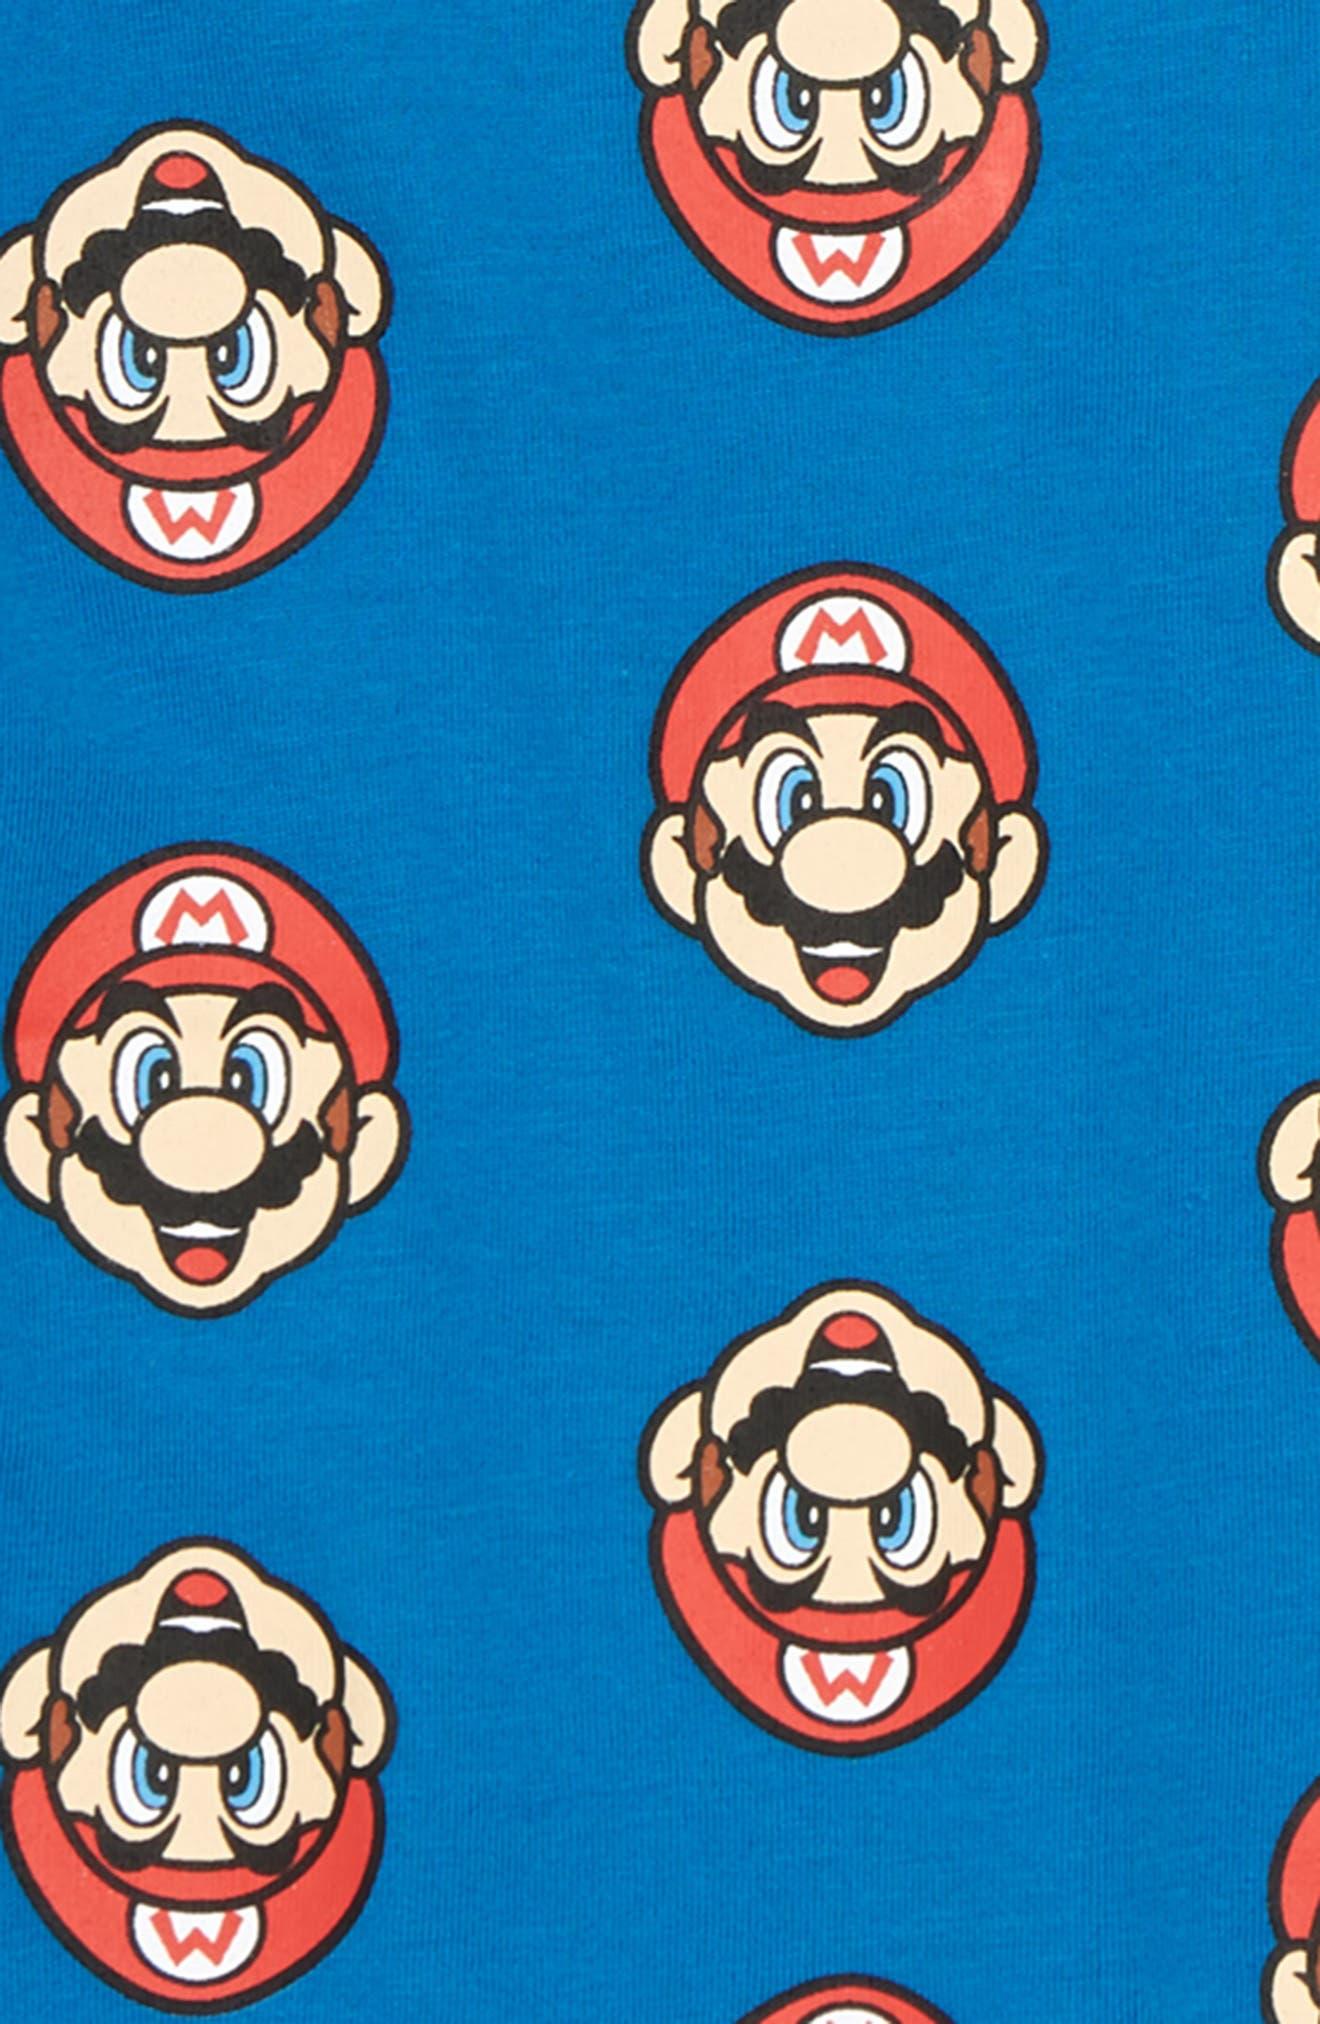 Nintendo Mario<sup>®</sup> Print T-Shirt,                             Alternate thumbnail 2, color,                             Blue